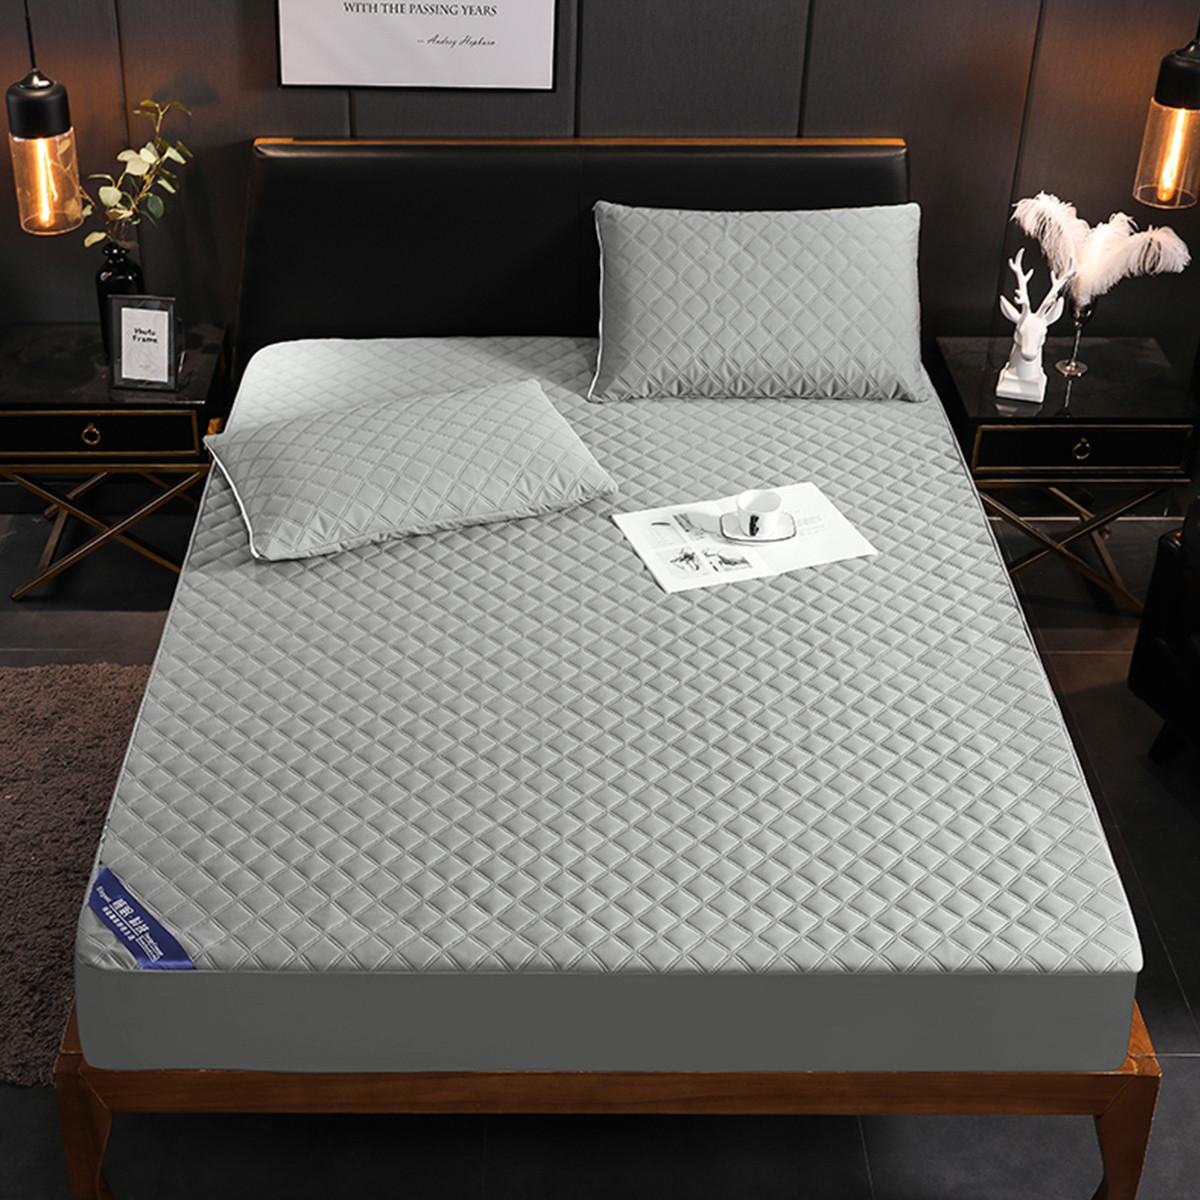 Ramada新款可机洗透气防水隔尿床笠榻榻米床垫床褥子床笠床褥薄床垫COLOR灰色